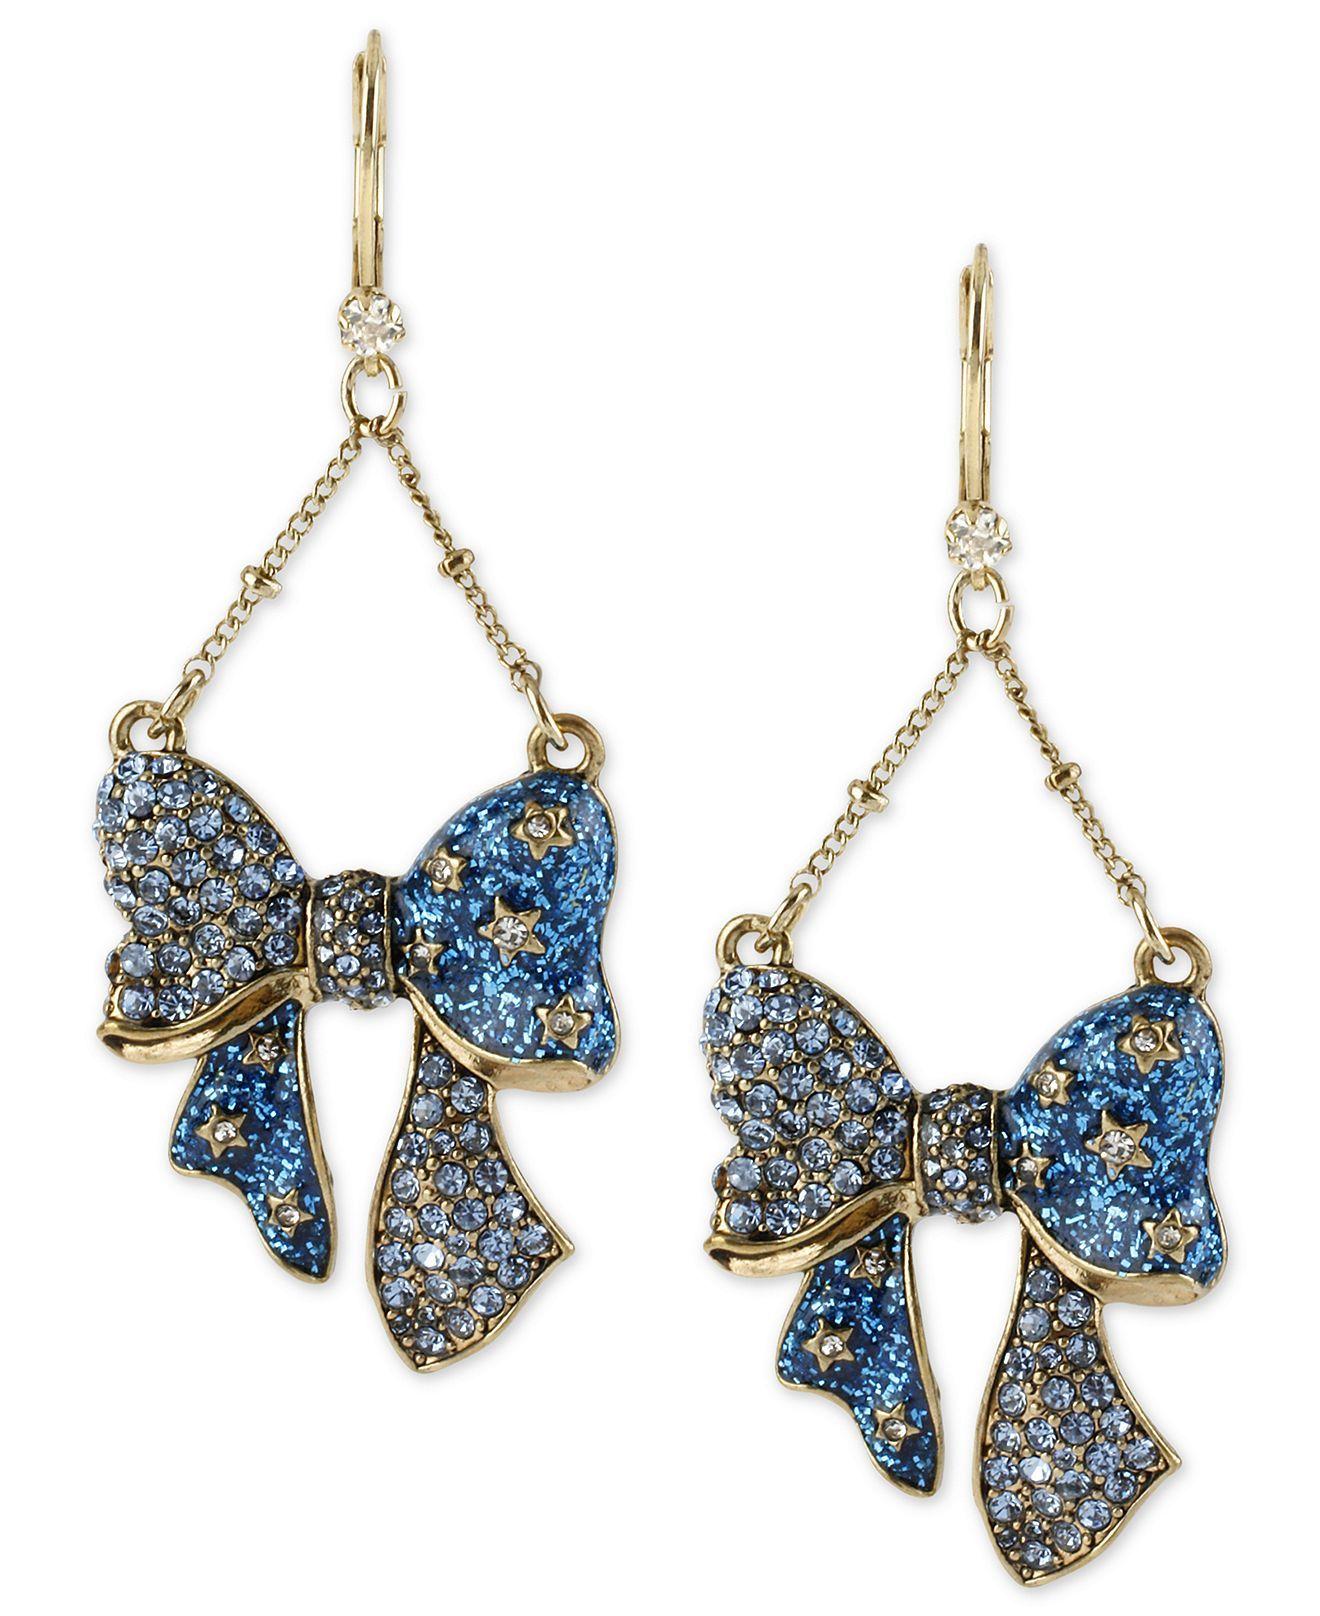 Betsey Johnson Earrings, Antique Gold-Tone Glass Bow Chandelier ...